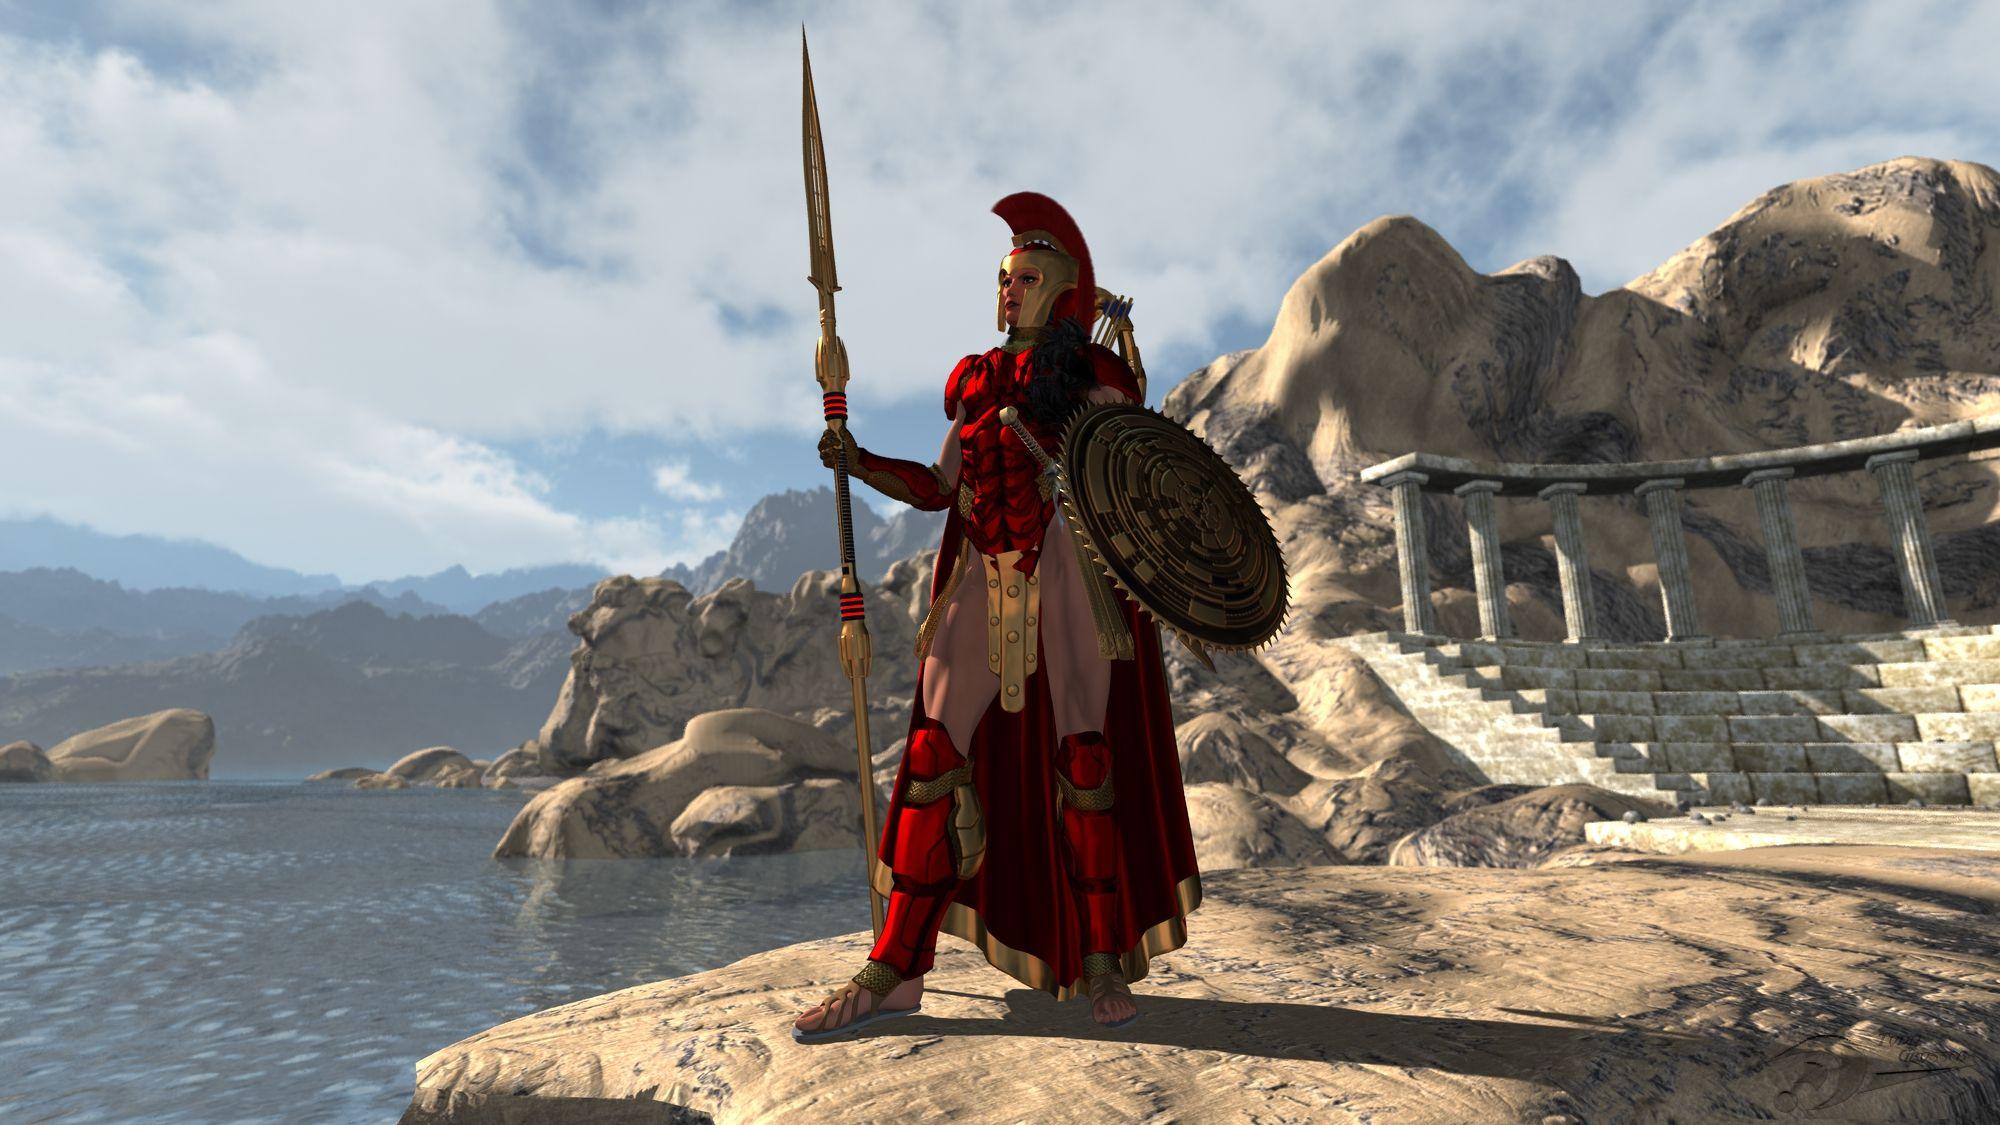 Athena Goddess of wisdom and Battle.